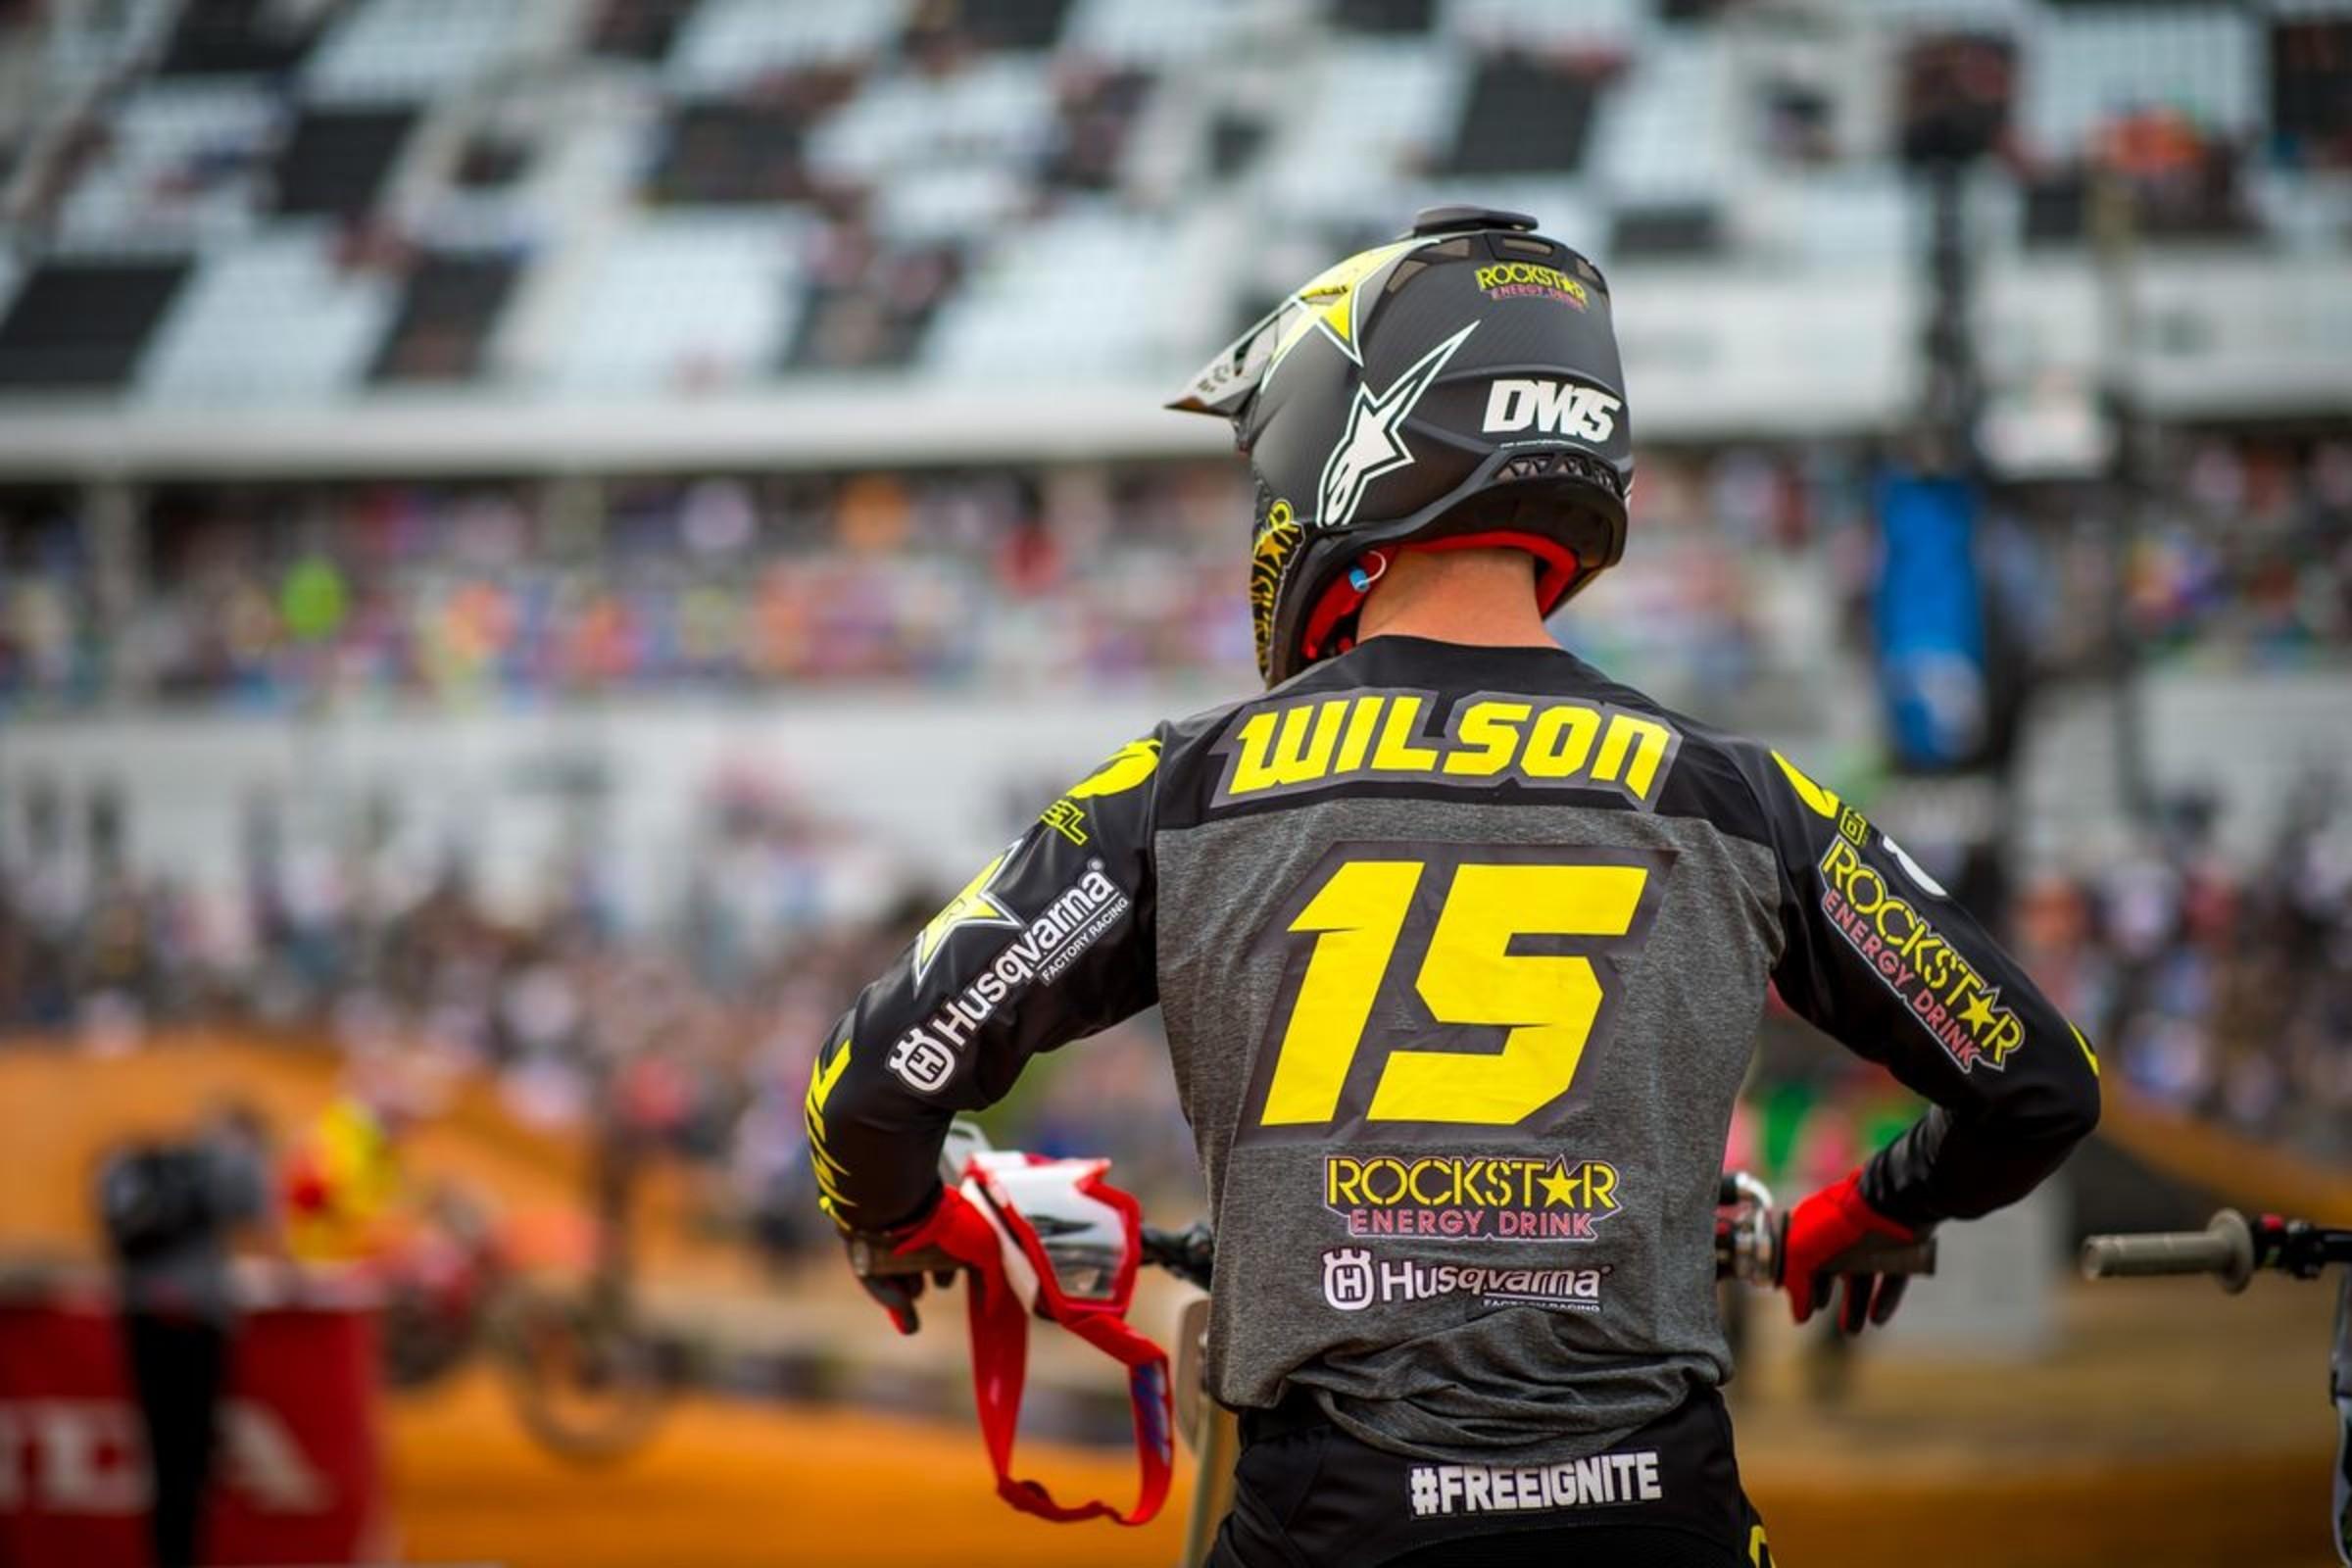 Dean Wilson Chances Of Making 2019 Hangtown Slim Motocross Racer X Online